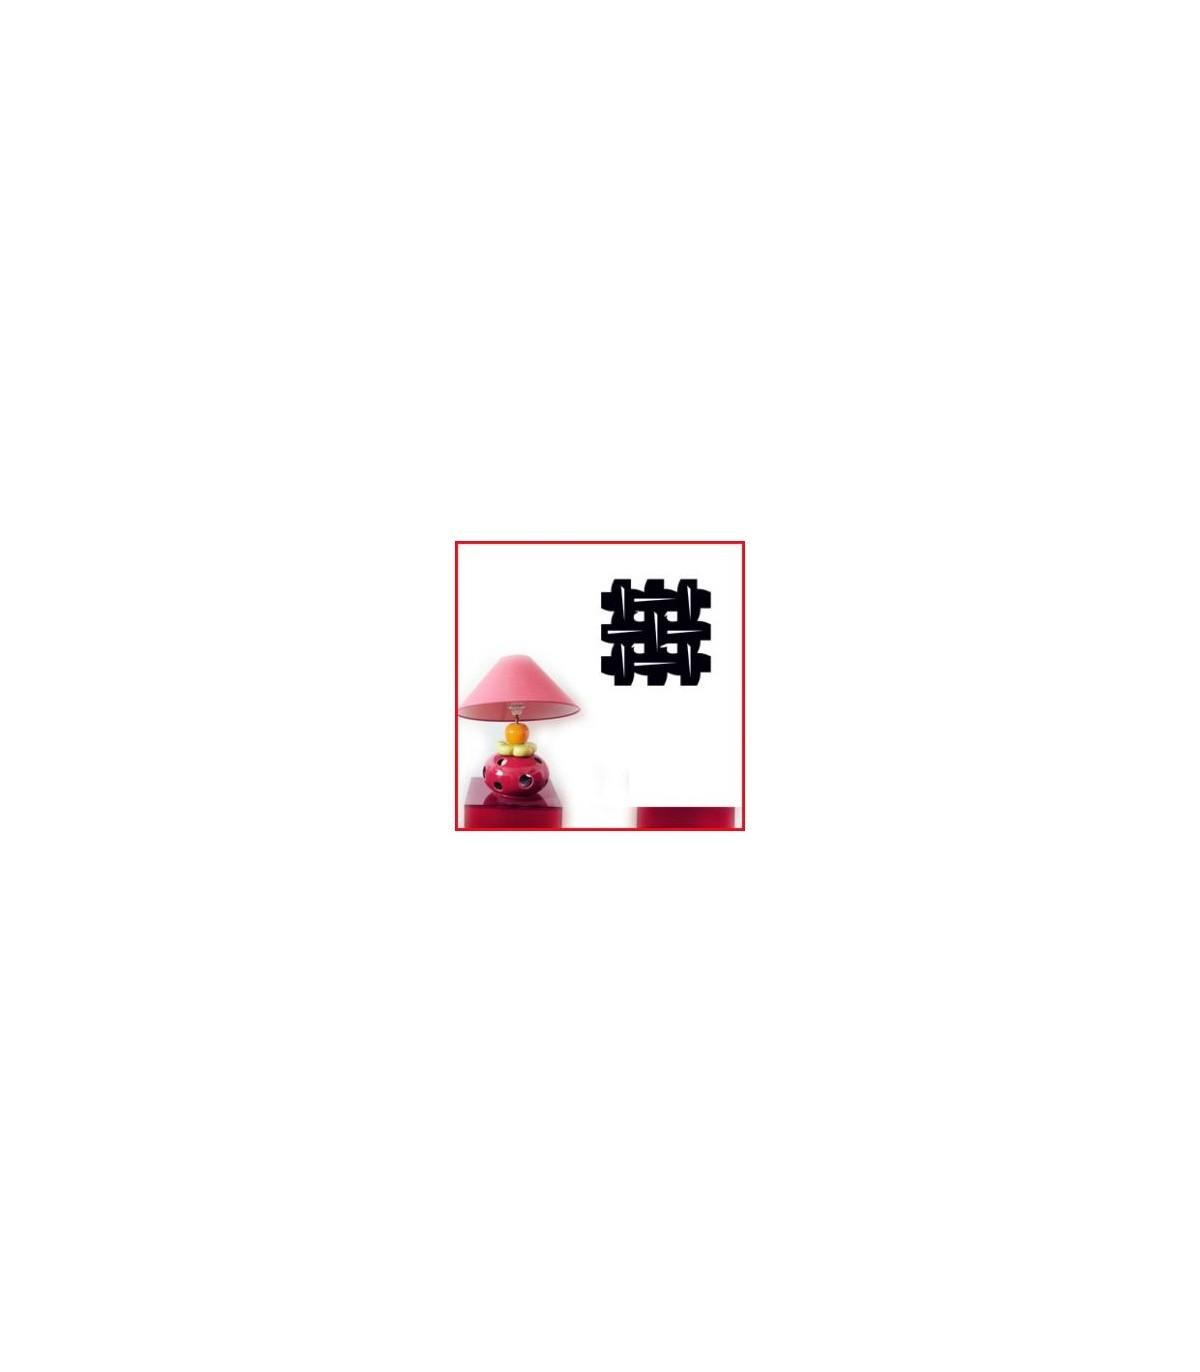 Sticker geometrique 4